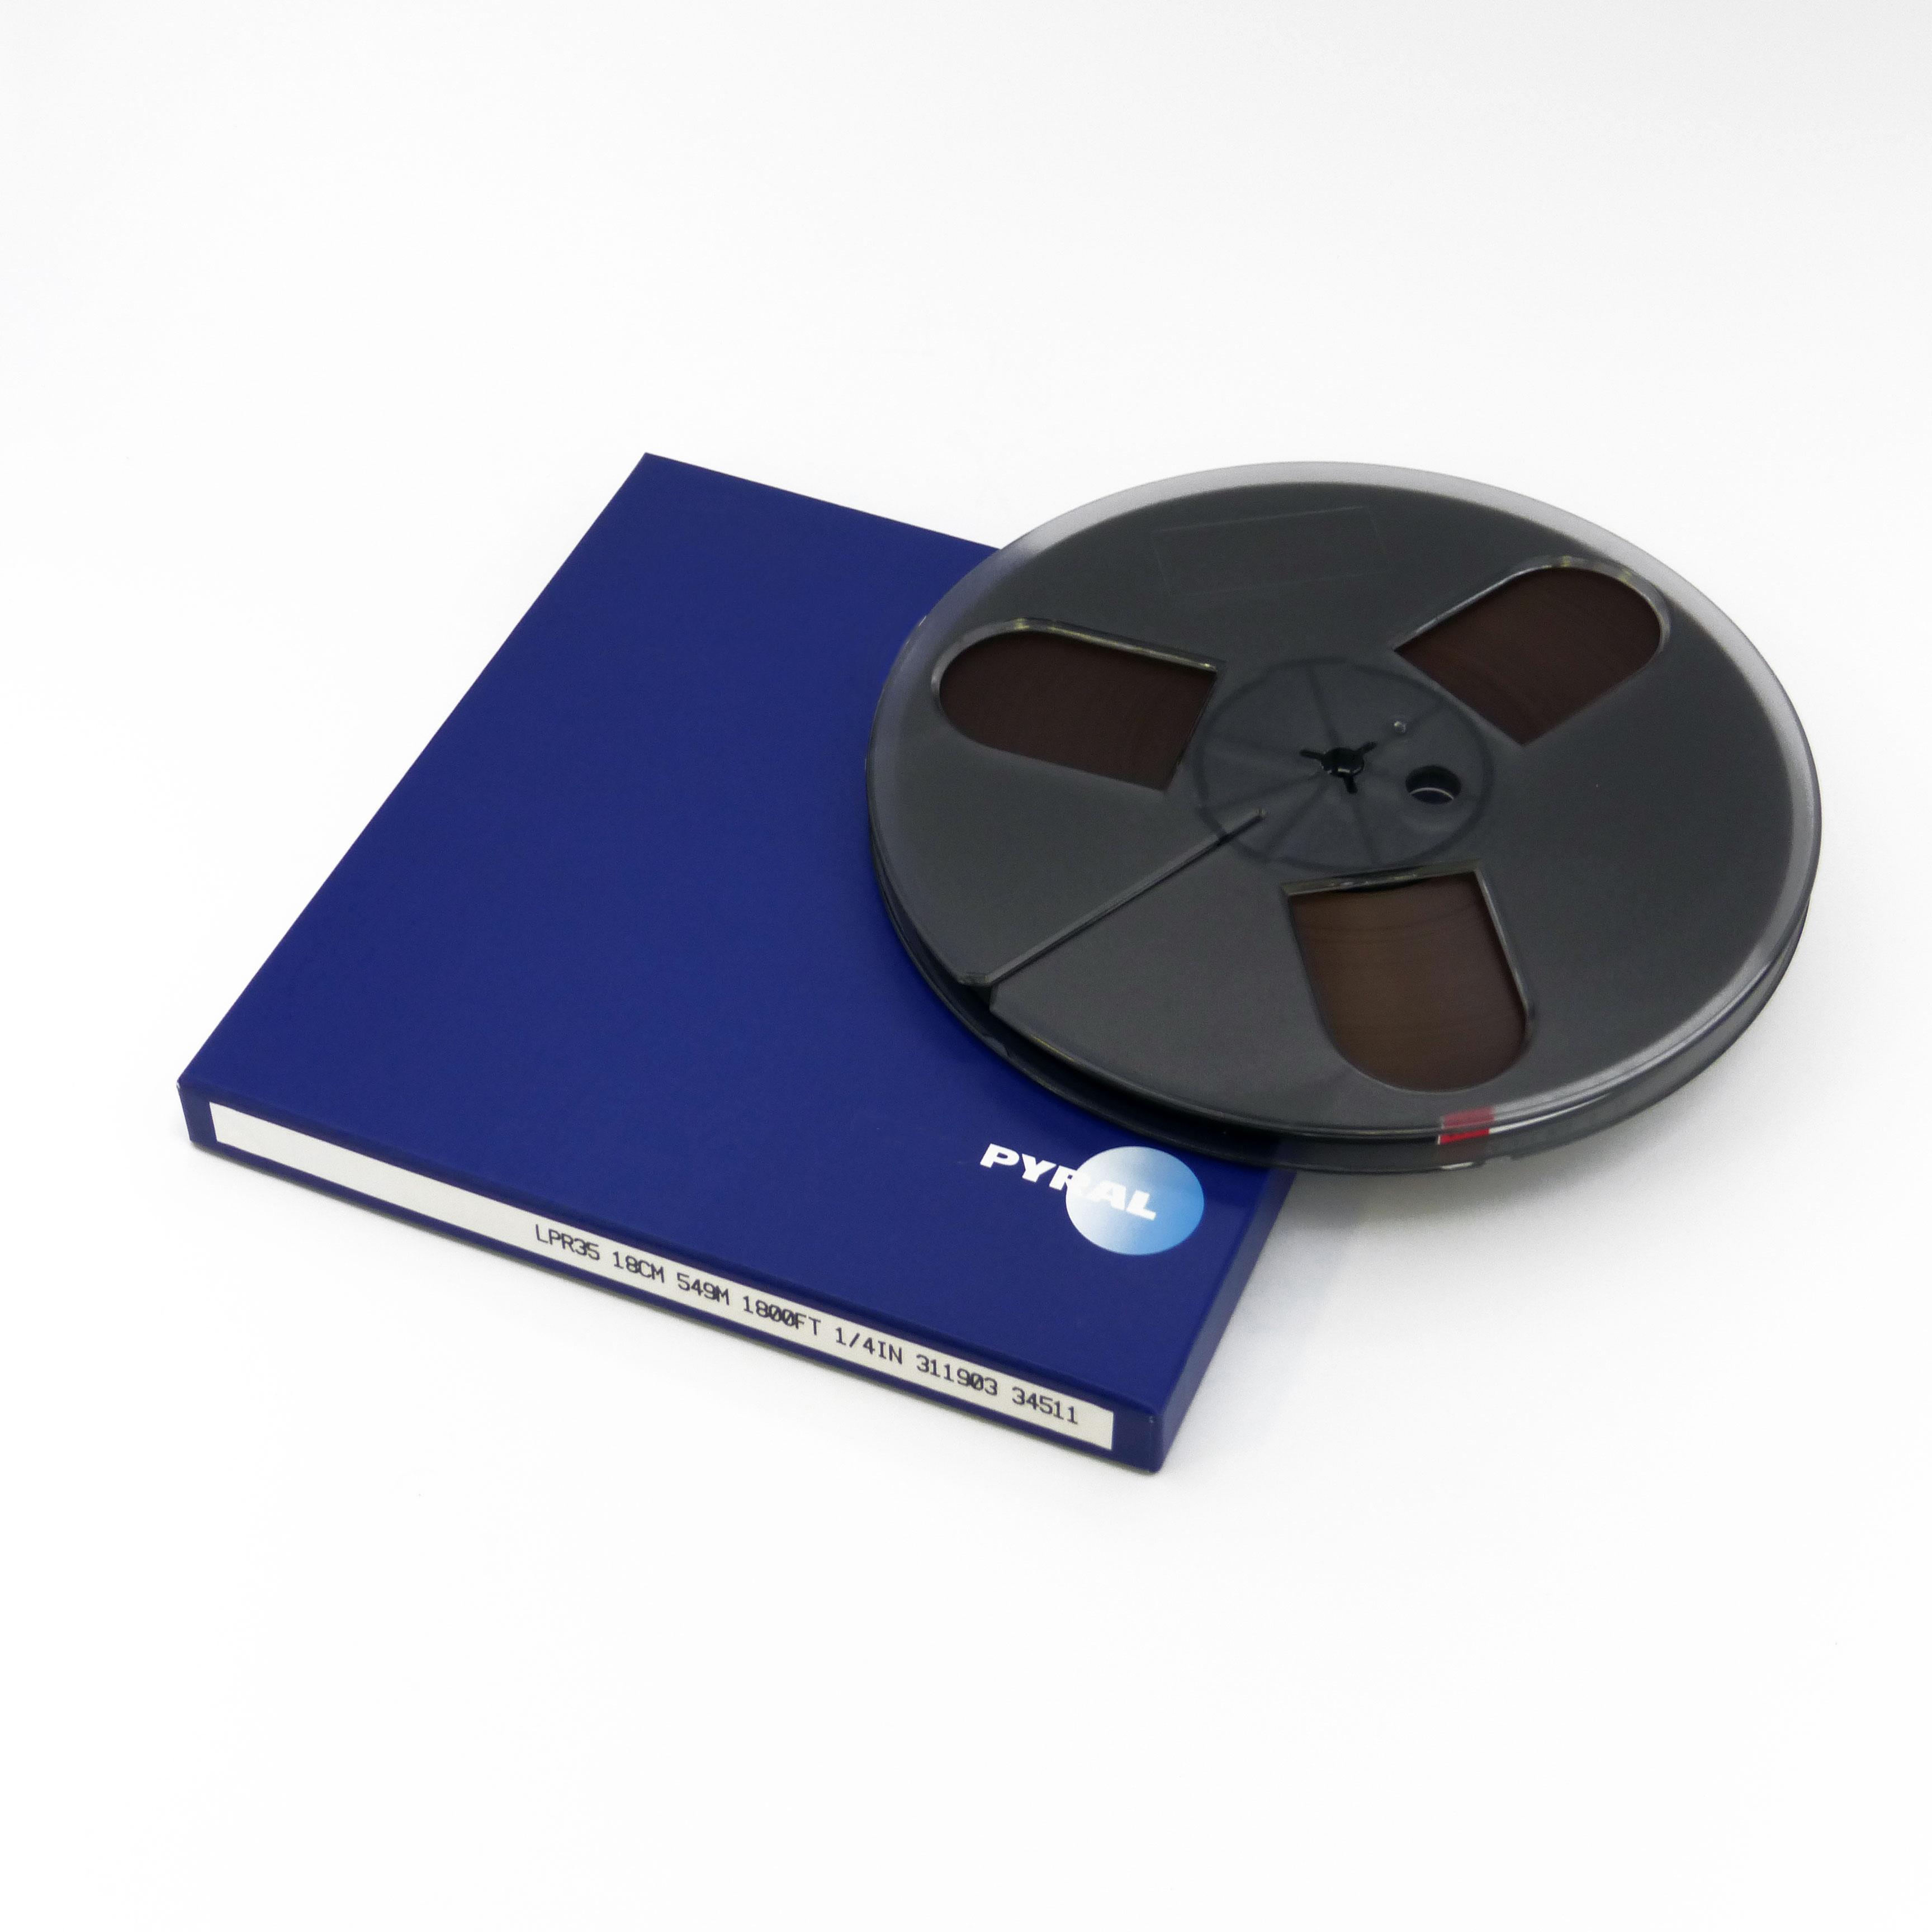 PYRAL(旧RMG) 7号オープンプラスチックリールテープ LPR35-1/4-1800(549m) 34511